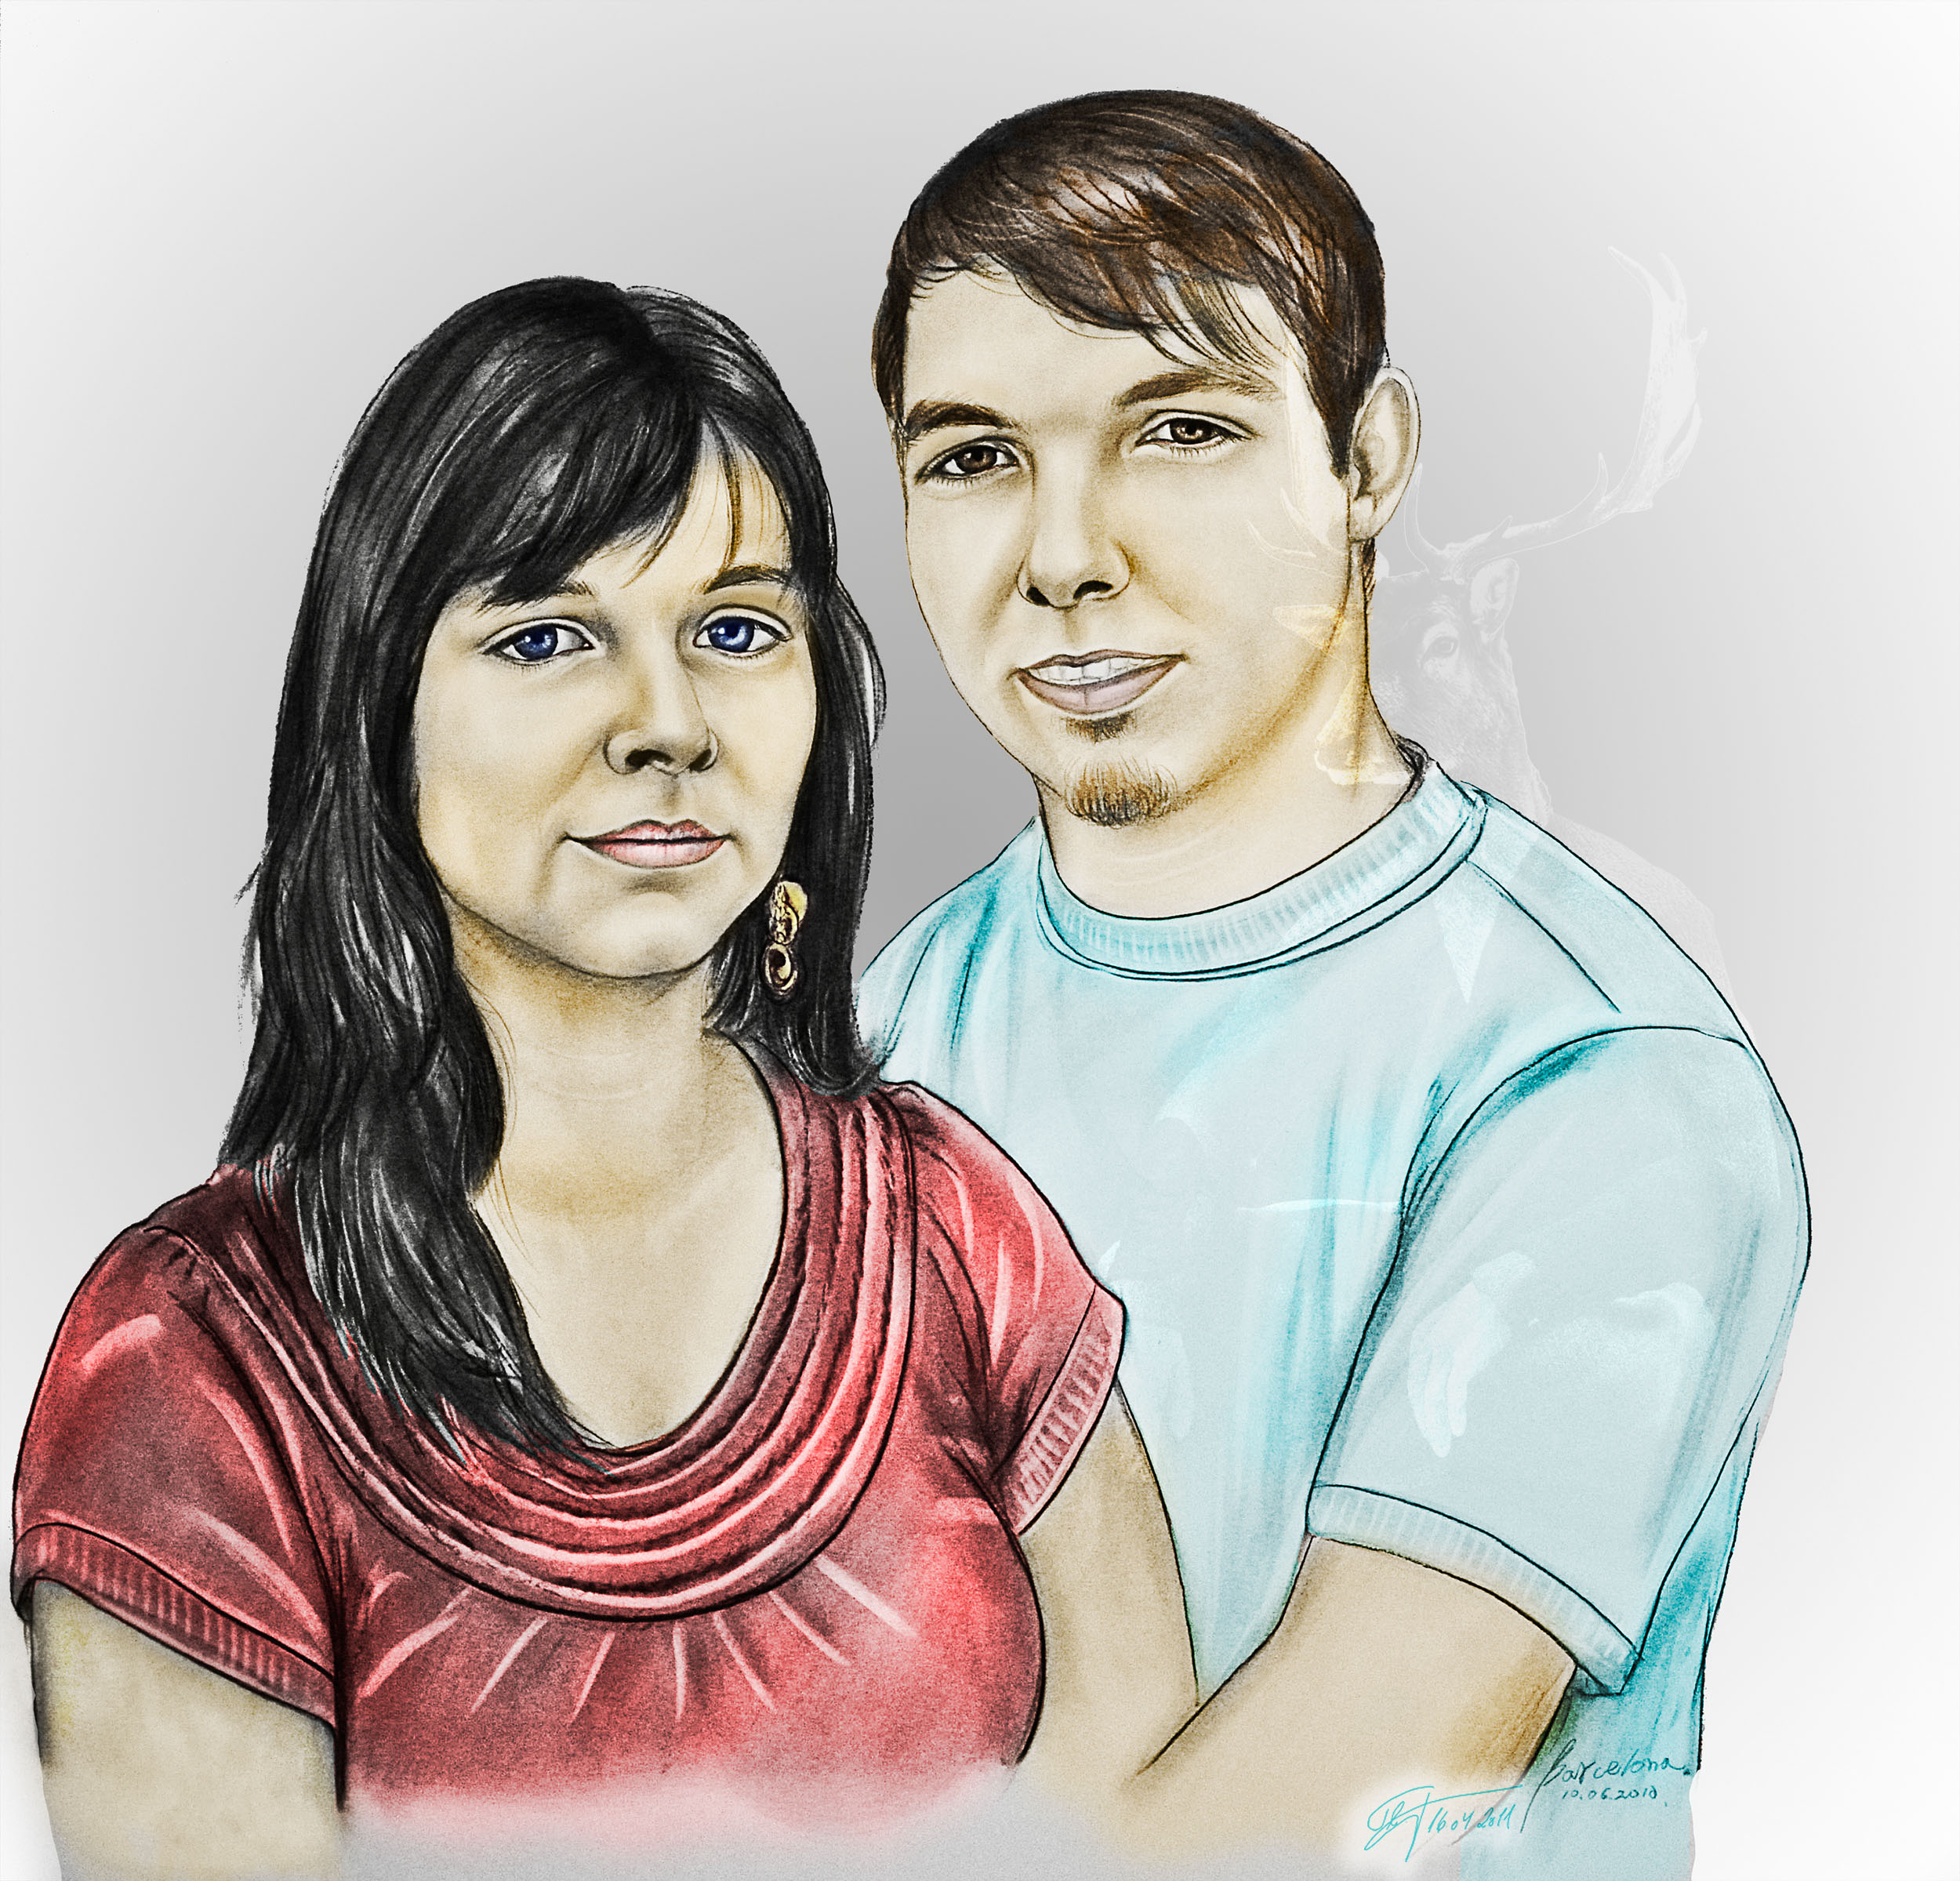 MWD; Contest; Portrait; Coloring